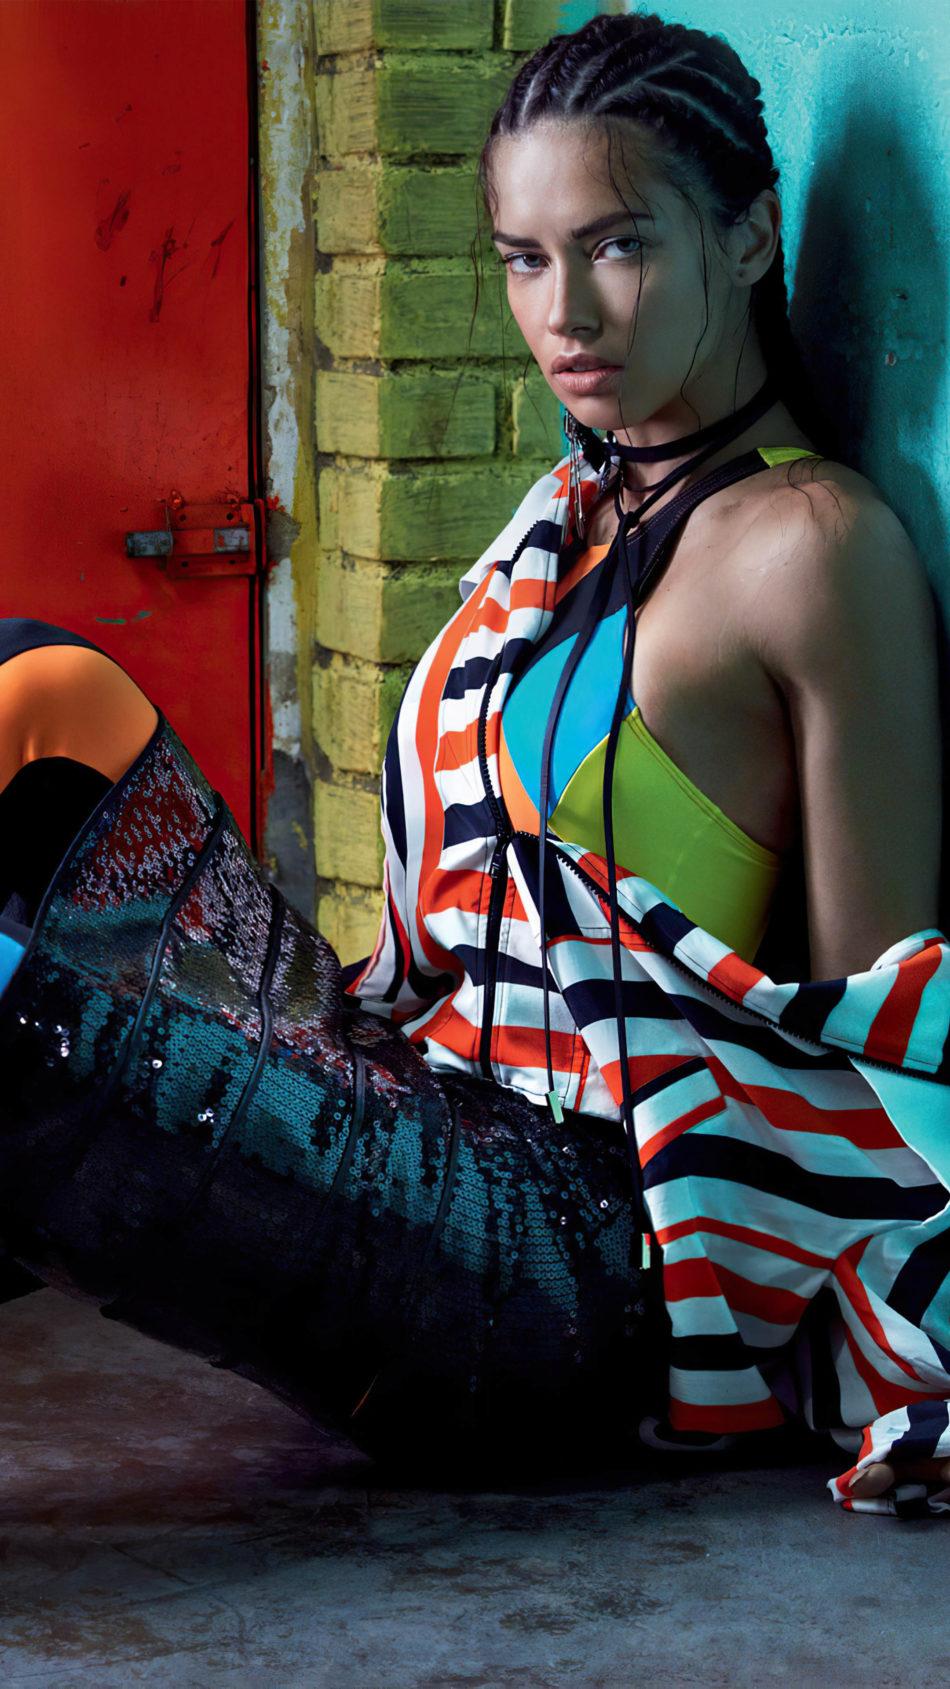 Model Adriana Lima 2020 4K Ultra HD Mobile Wallpaper